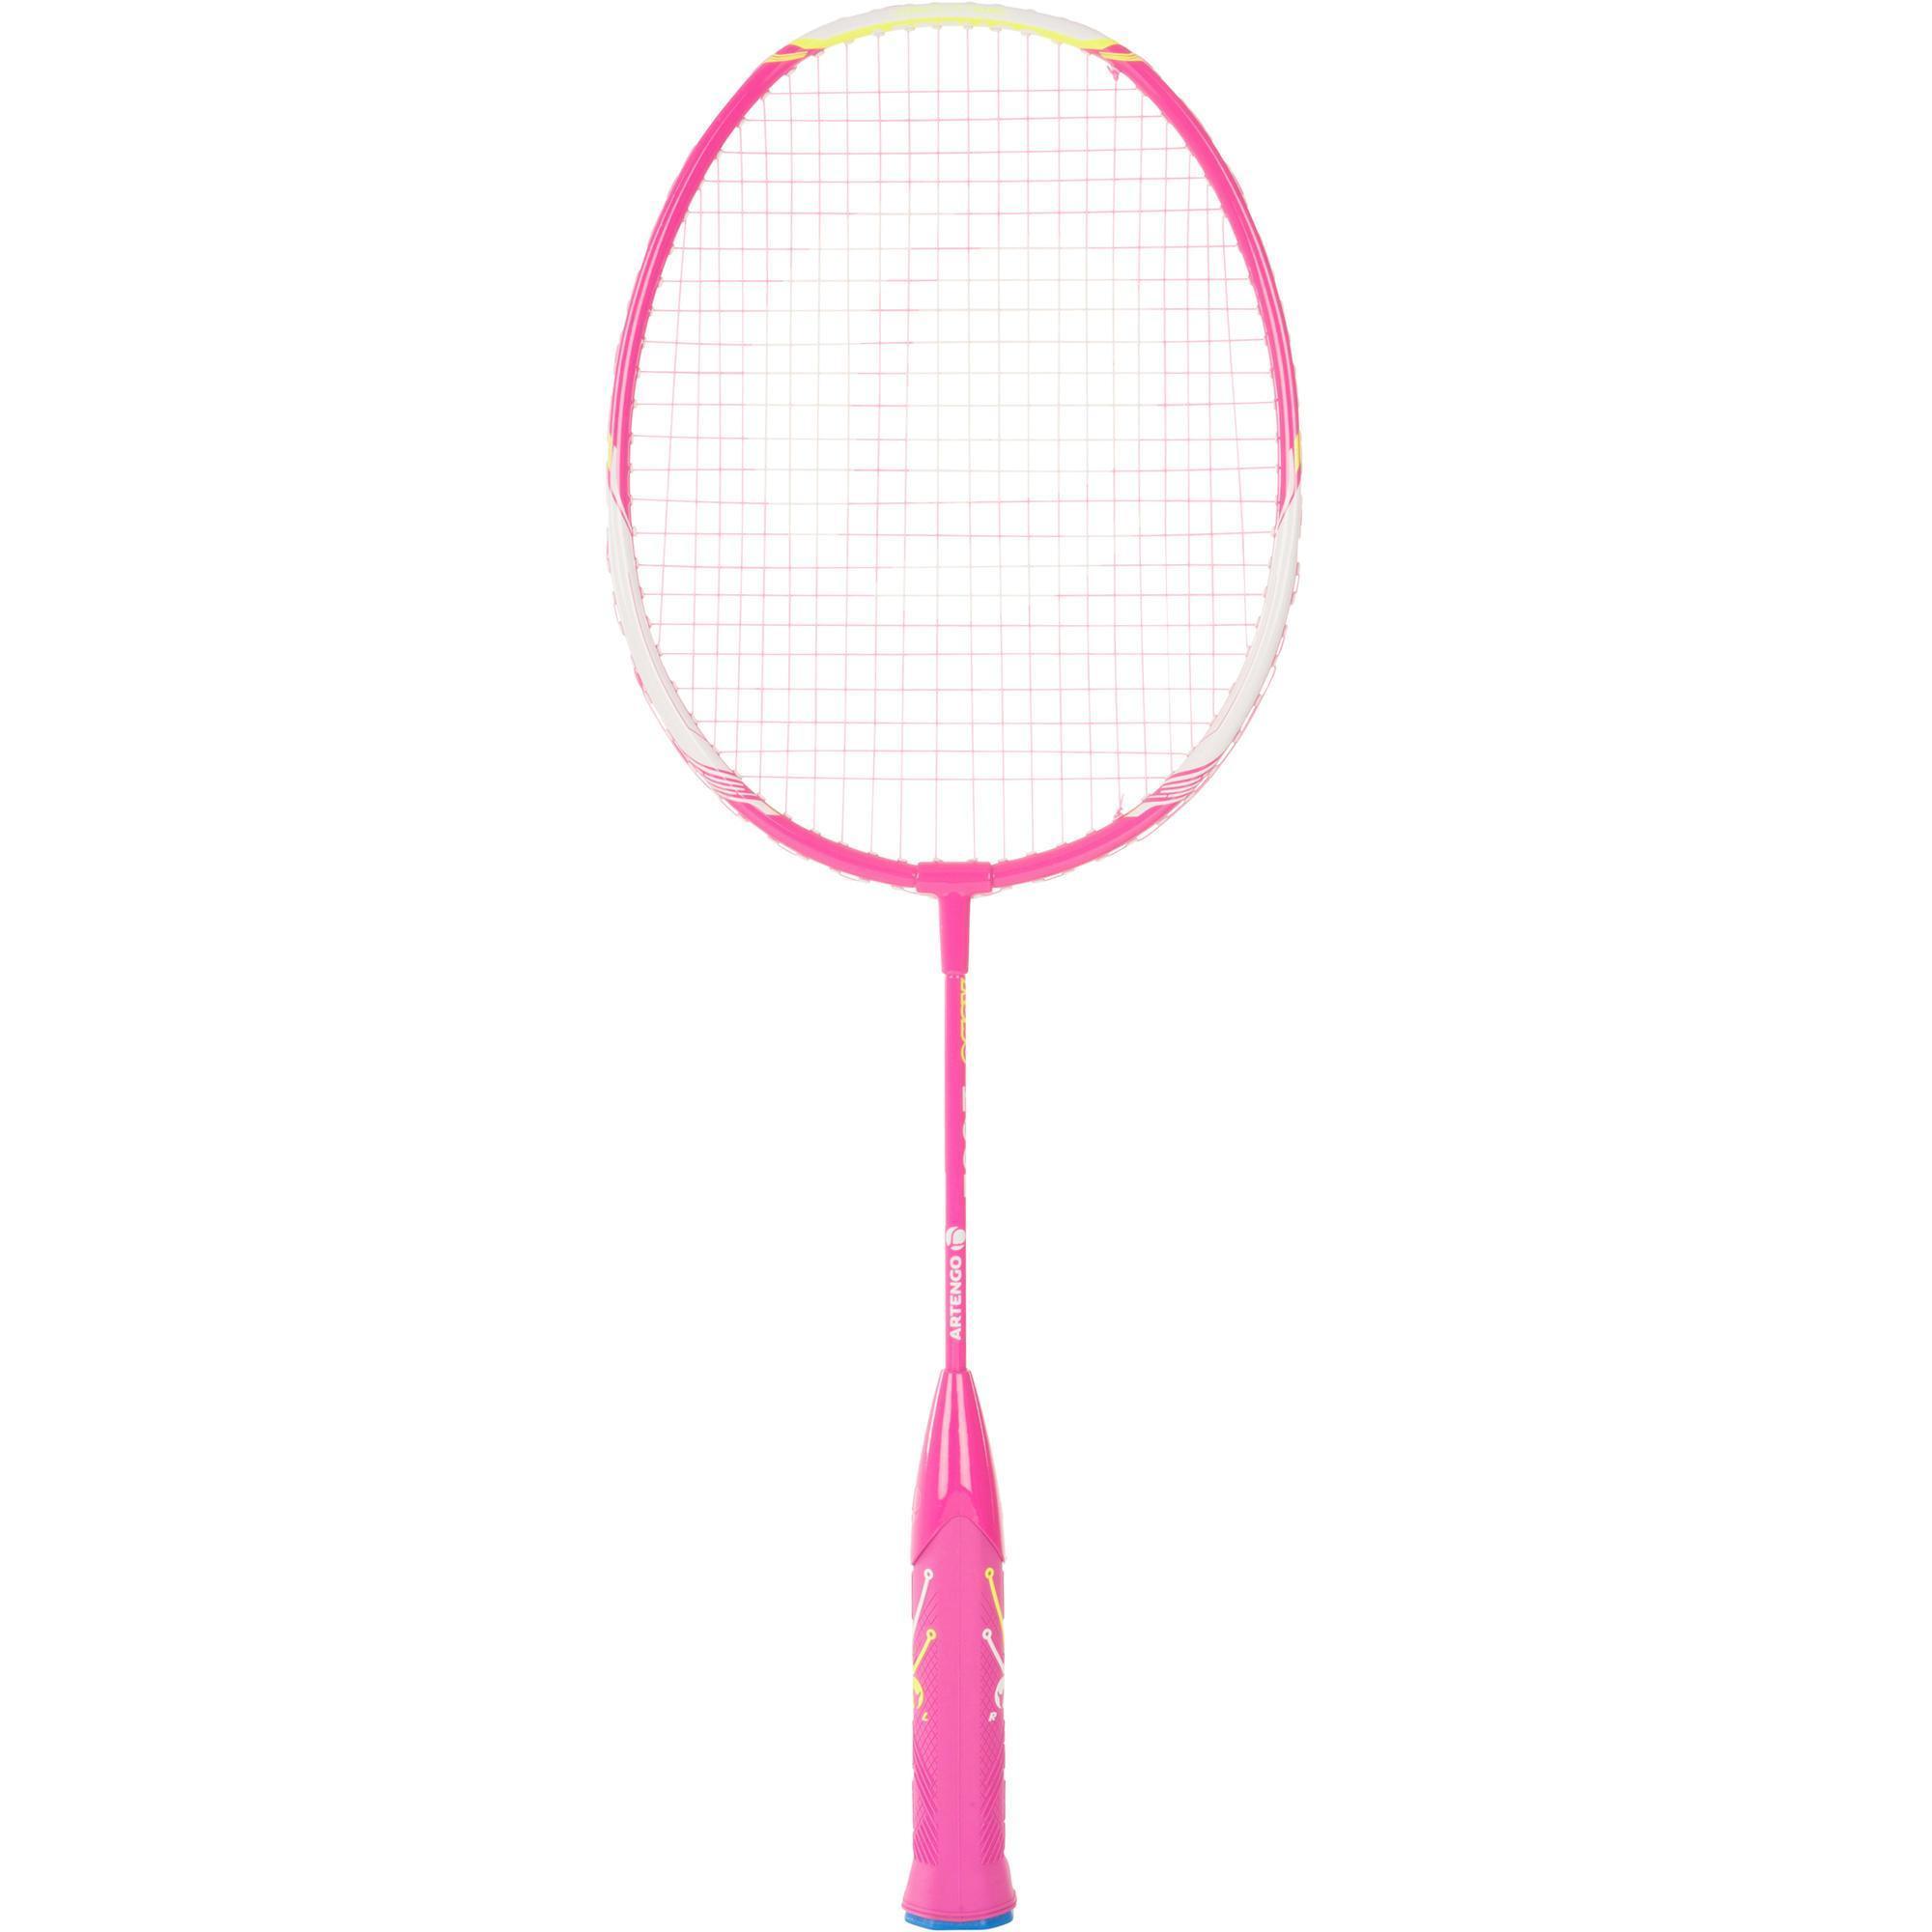 Perfly BR 700 JR Easy Grip badmintonracket voor kinderen